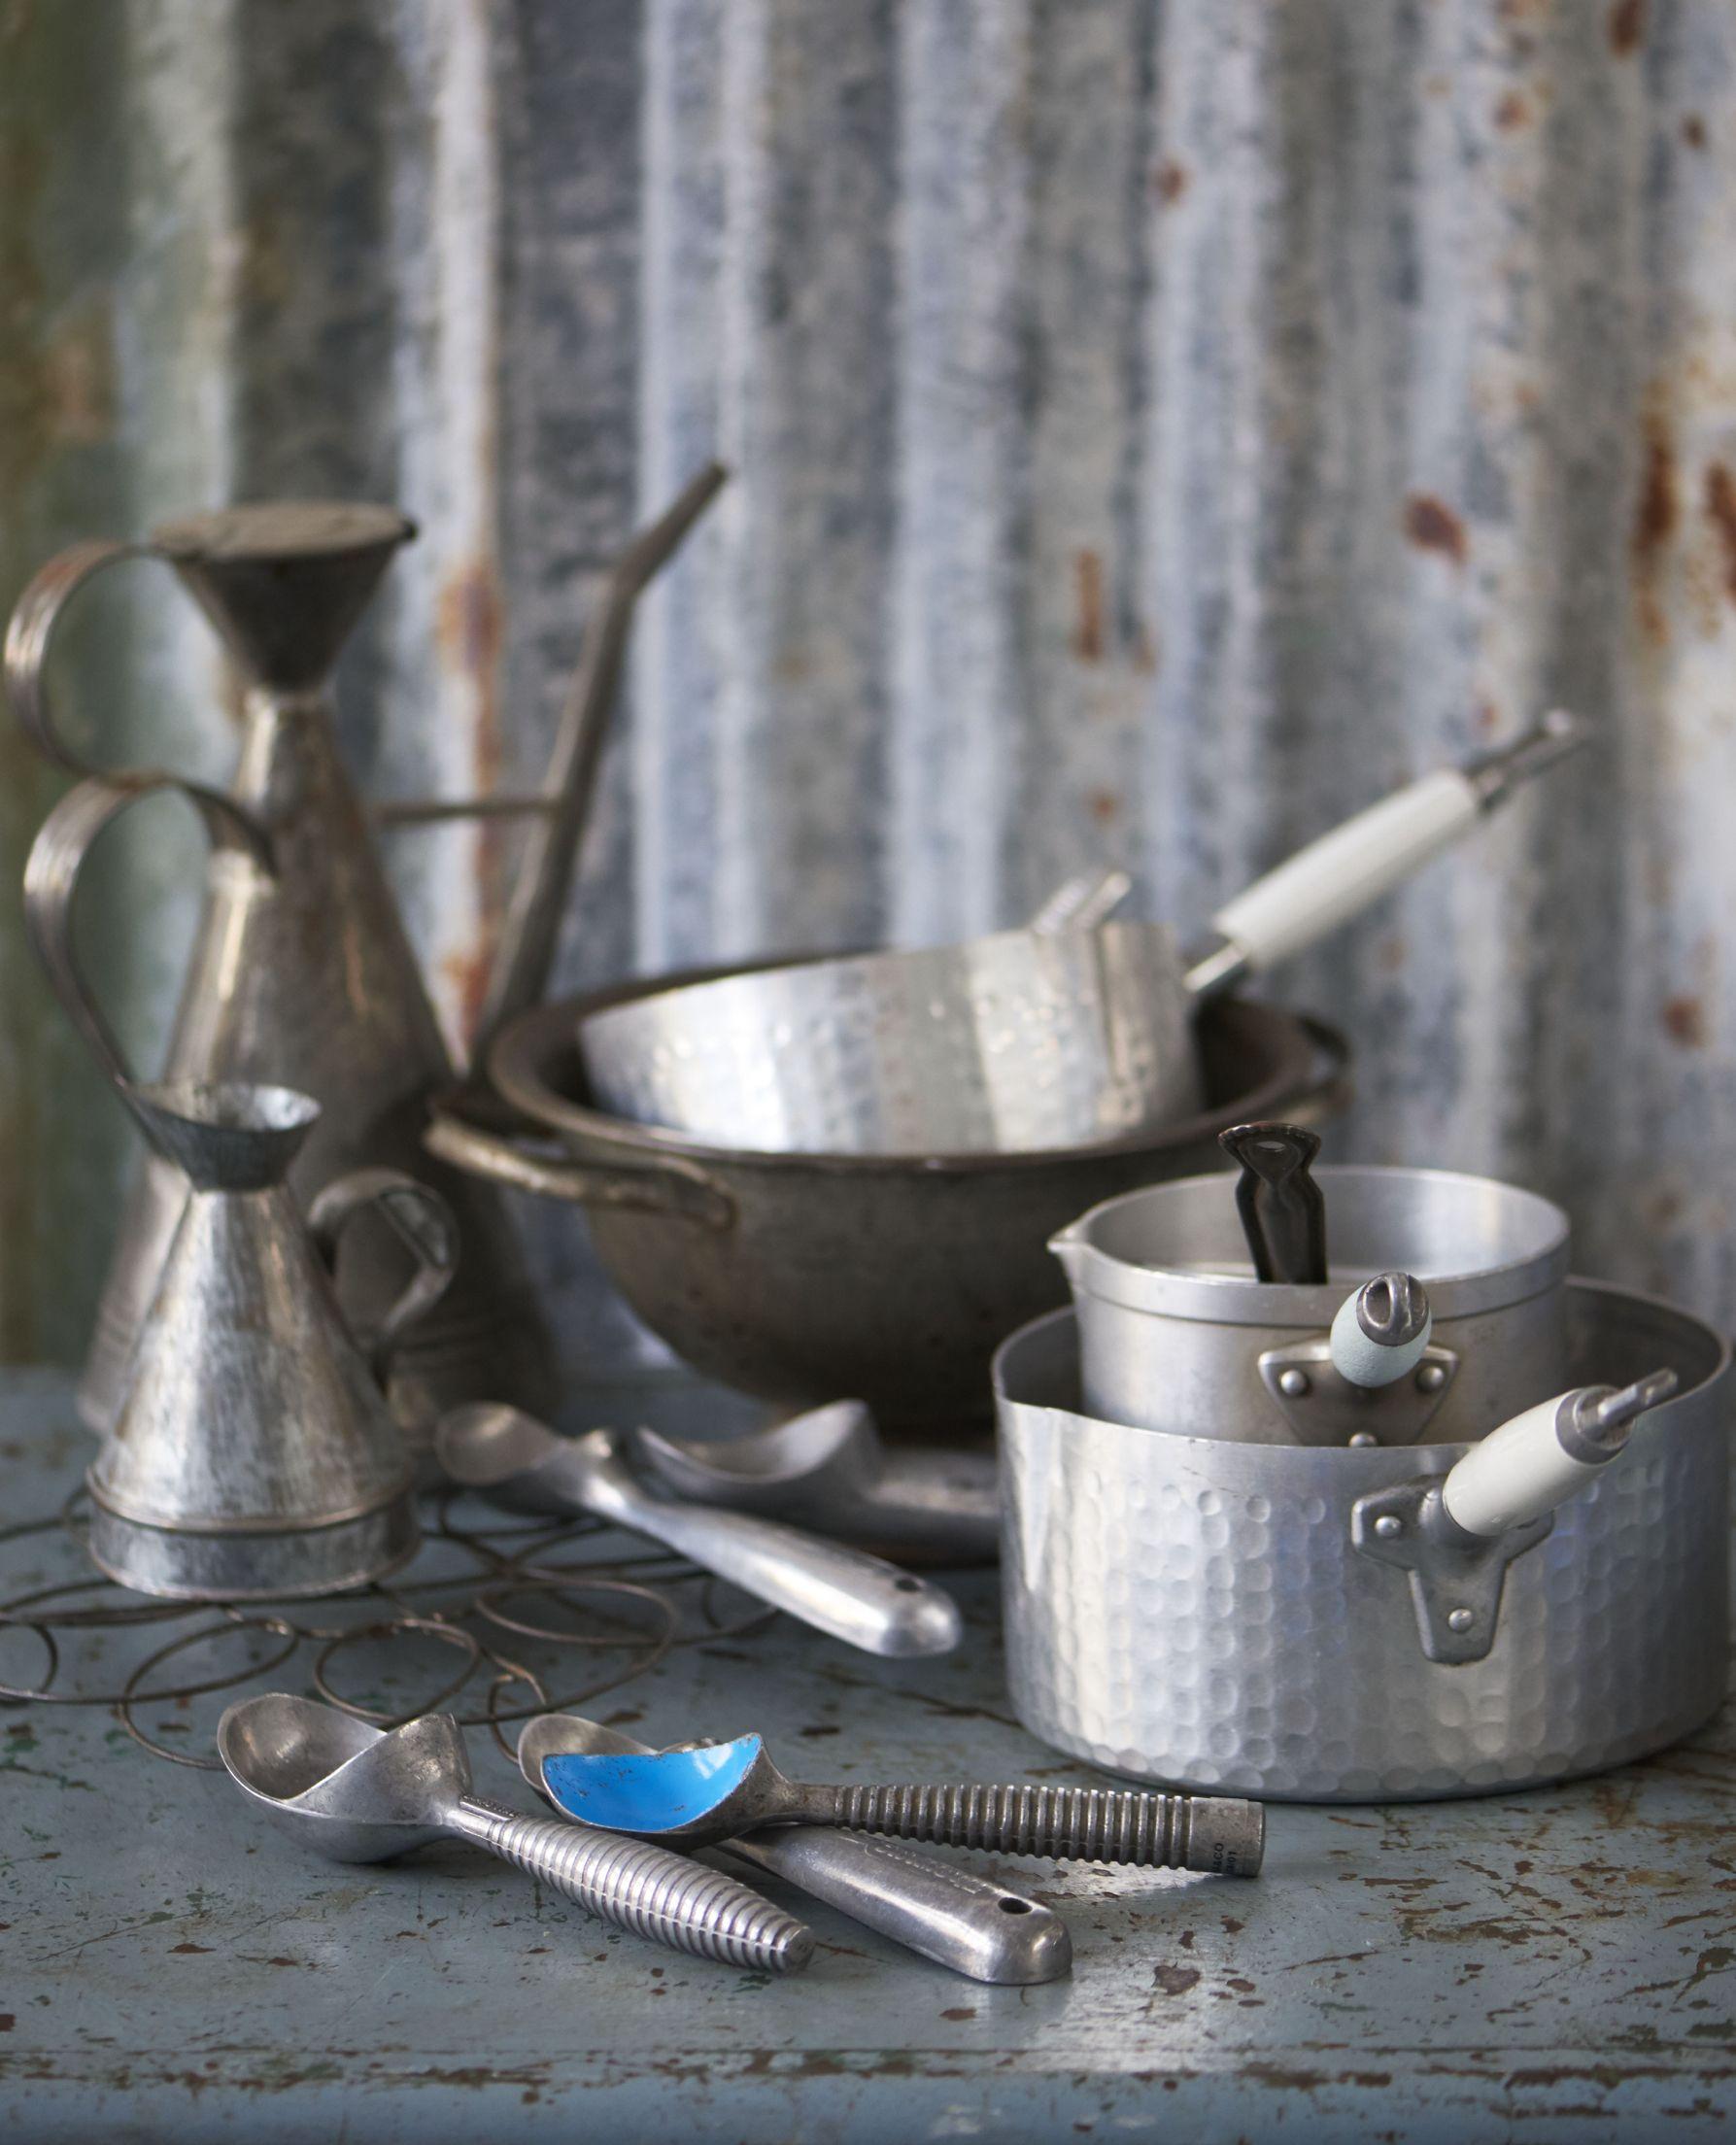 Vintage Kitchen Photography: Kitchen Still Life Shot Vintage Props- Saucepans Ice Cream Scoops Metal Daylight / Polly Webster